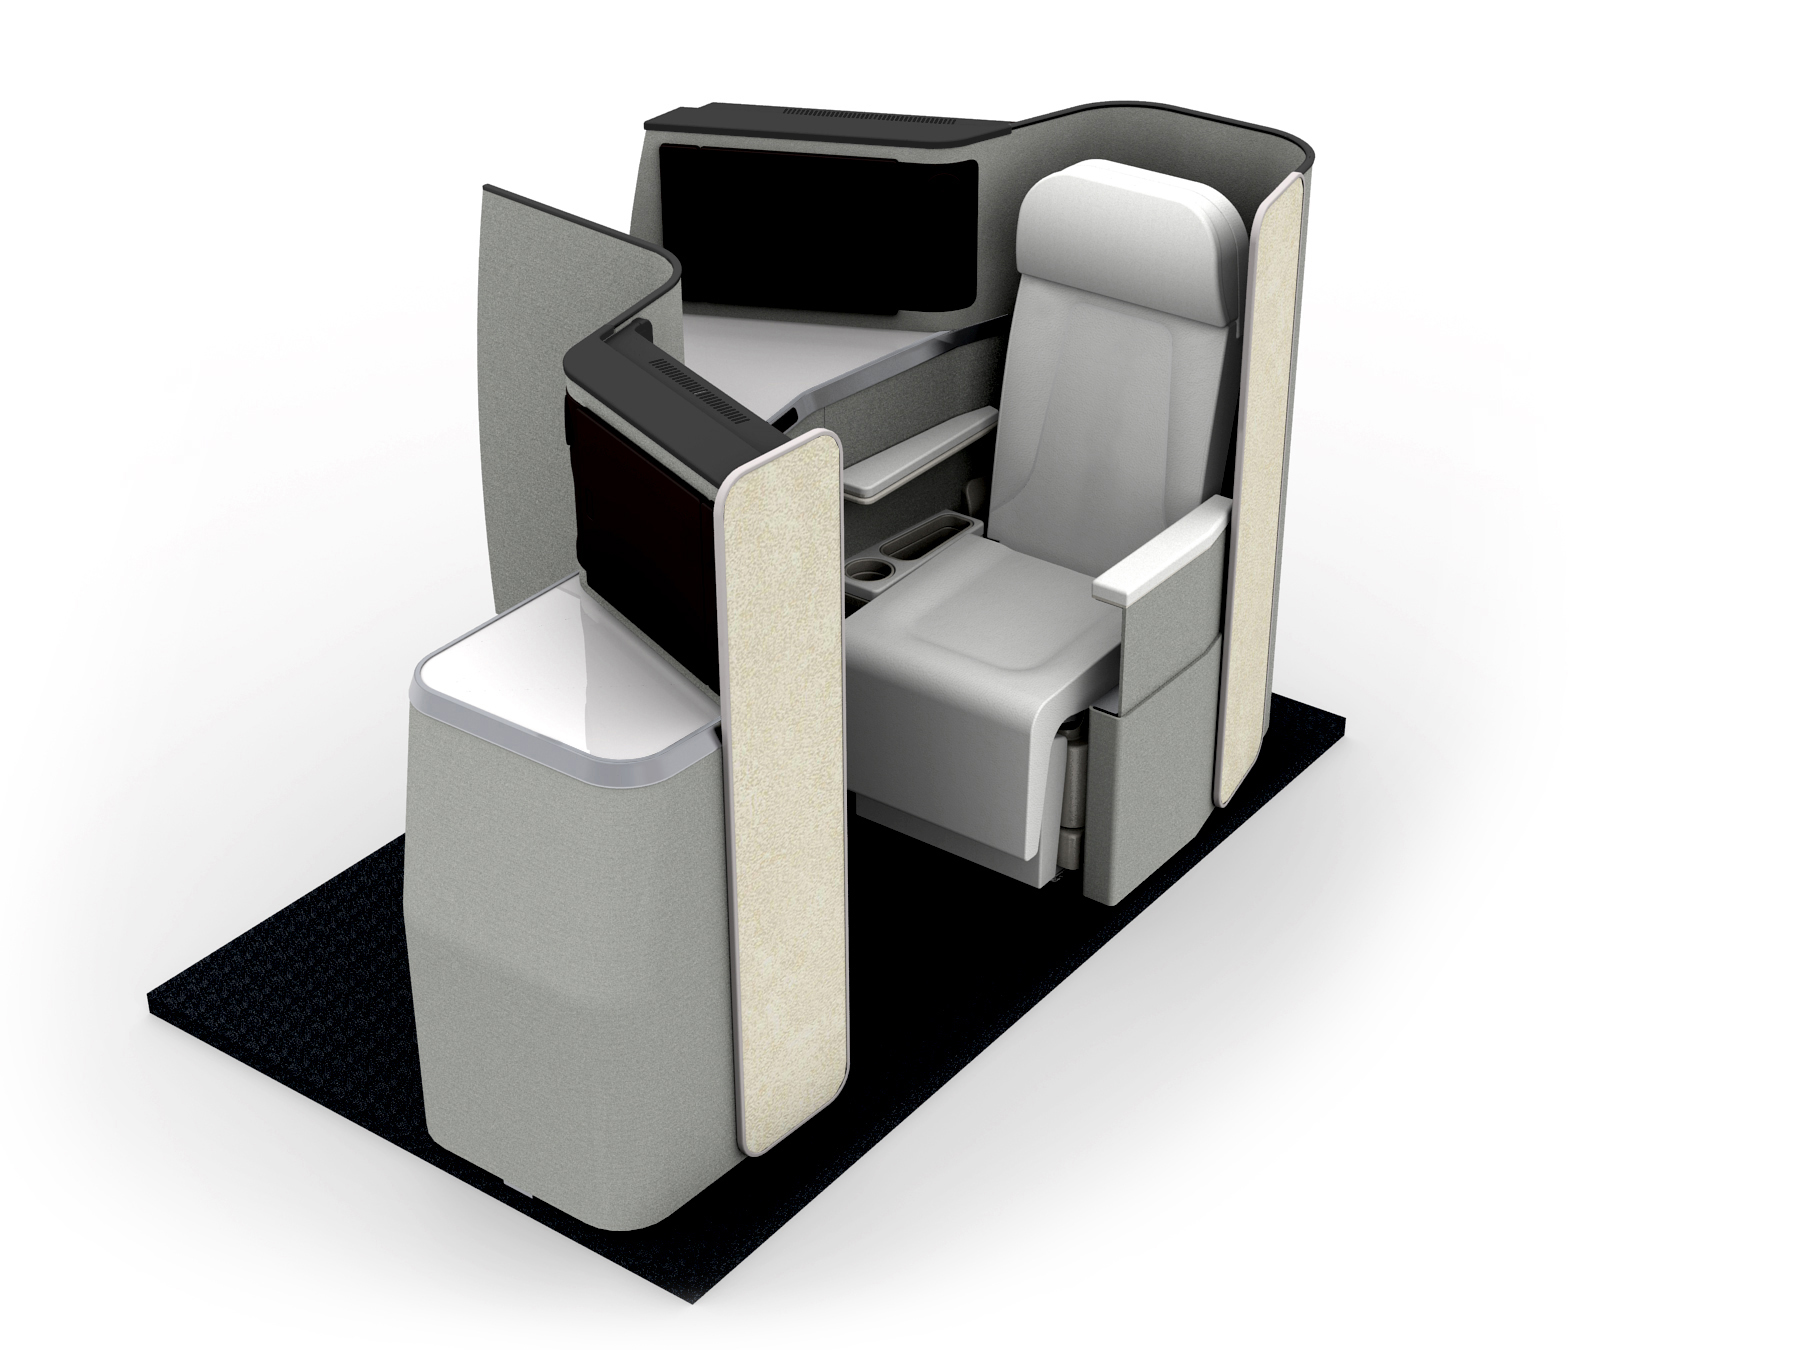 Aviointeriors new Business Class seat – ADAGIO